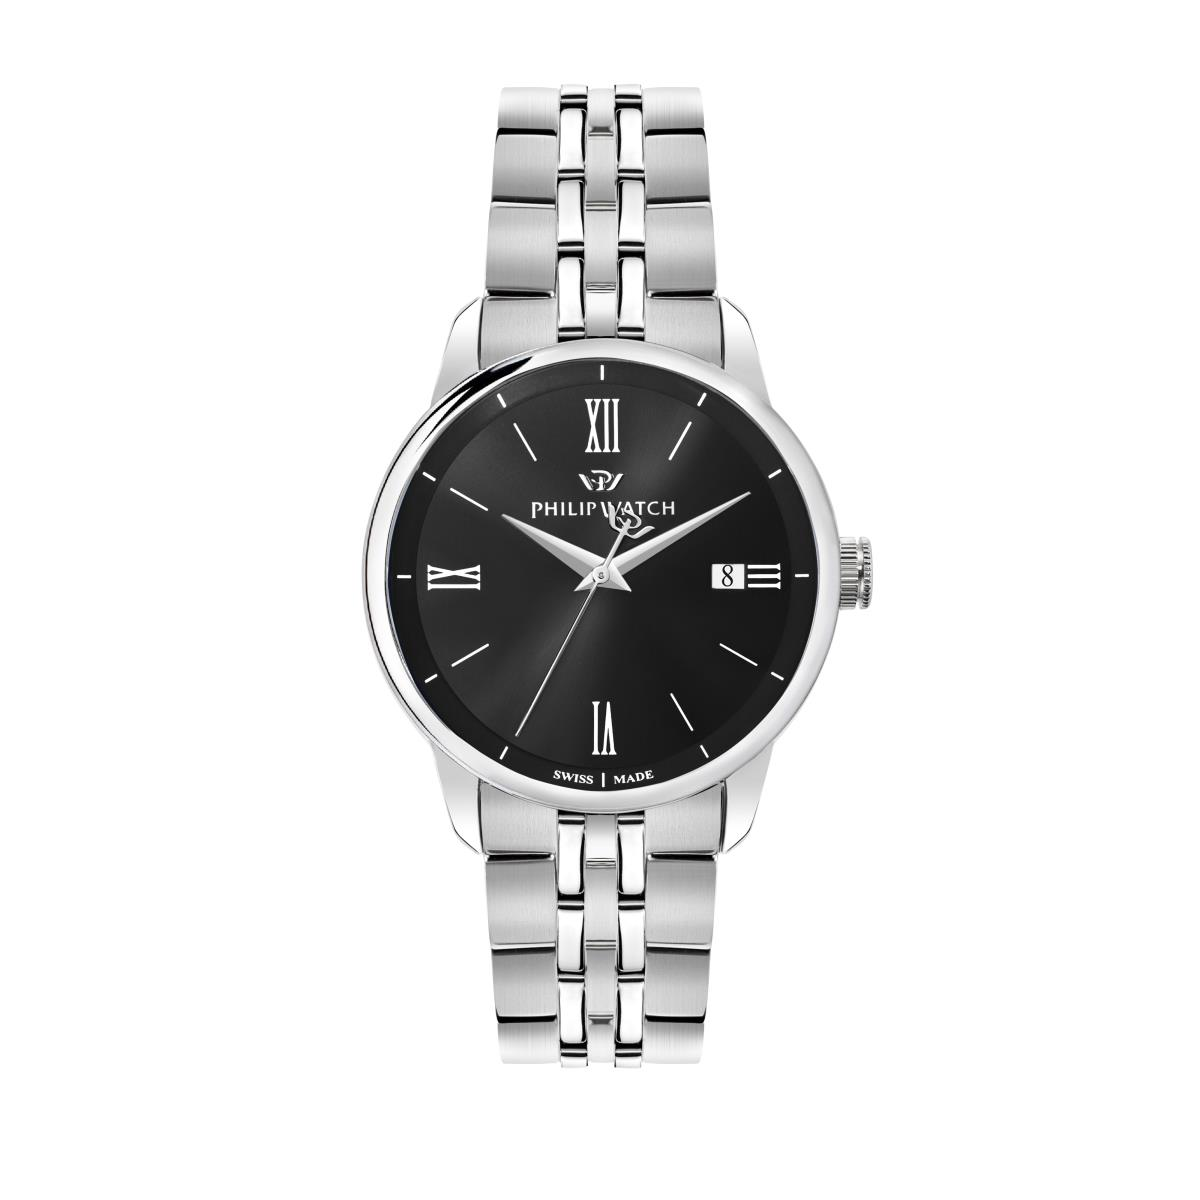 Orologio Philip Watch - Anniversary Ref. R8253150001 - PHILIP WATCH